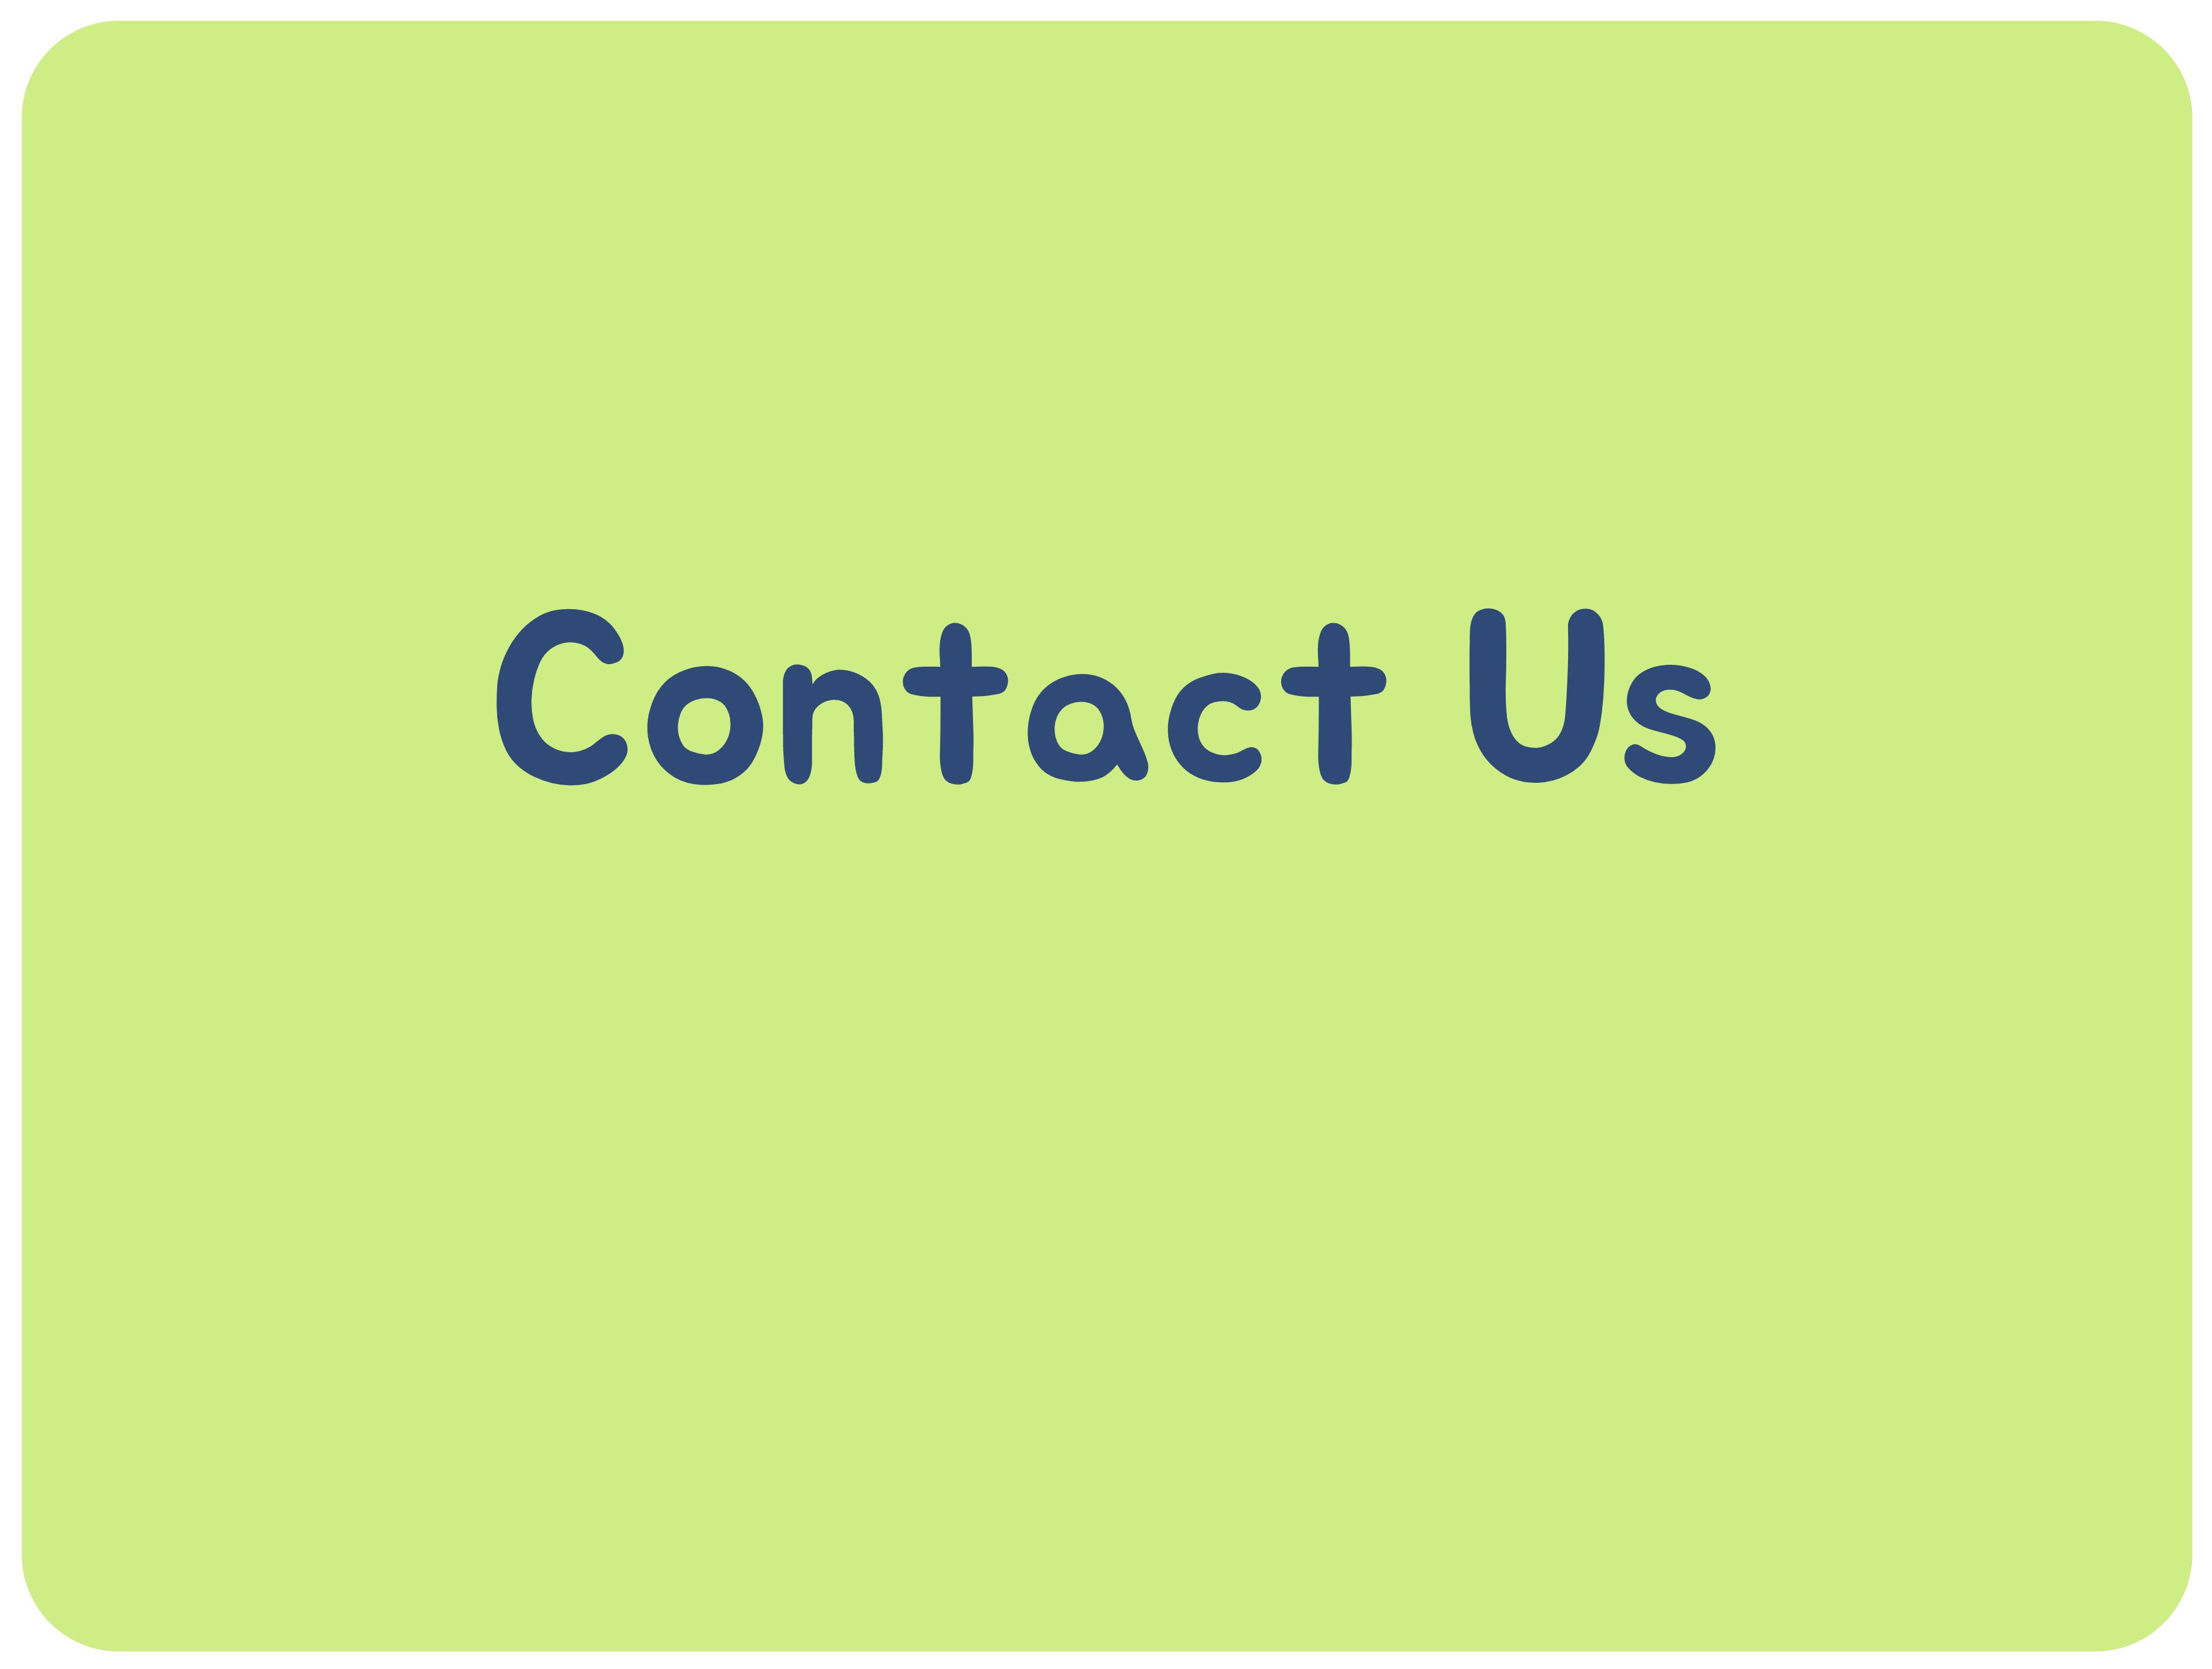 Contact Us Hilton Adelaide